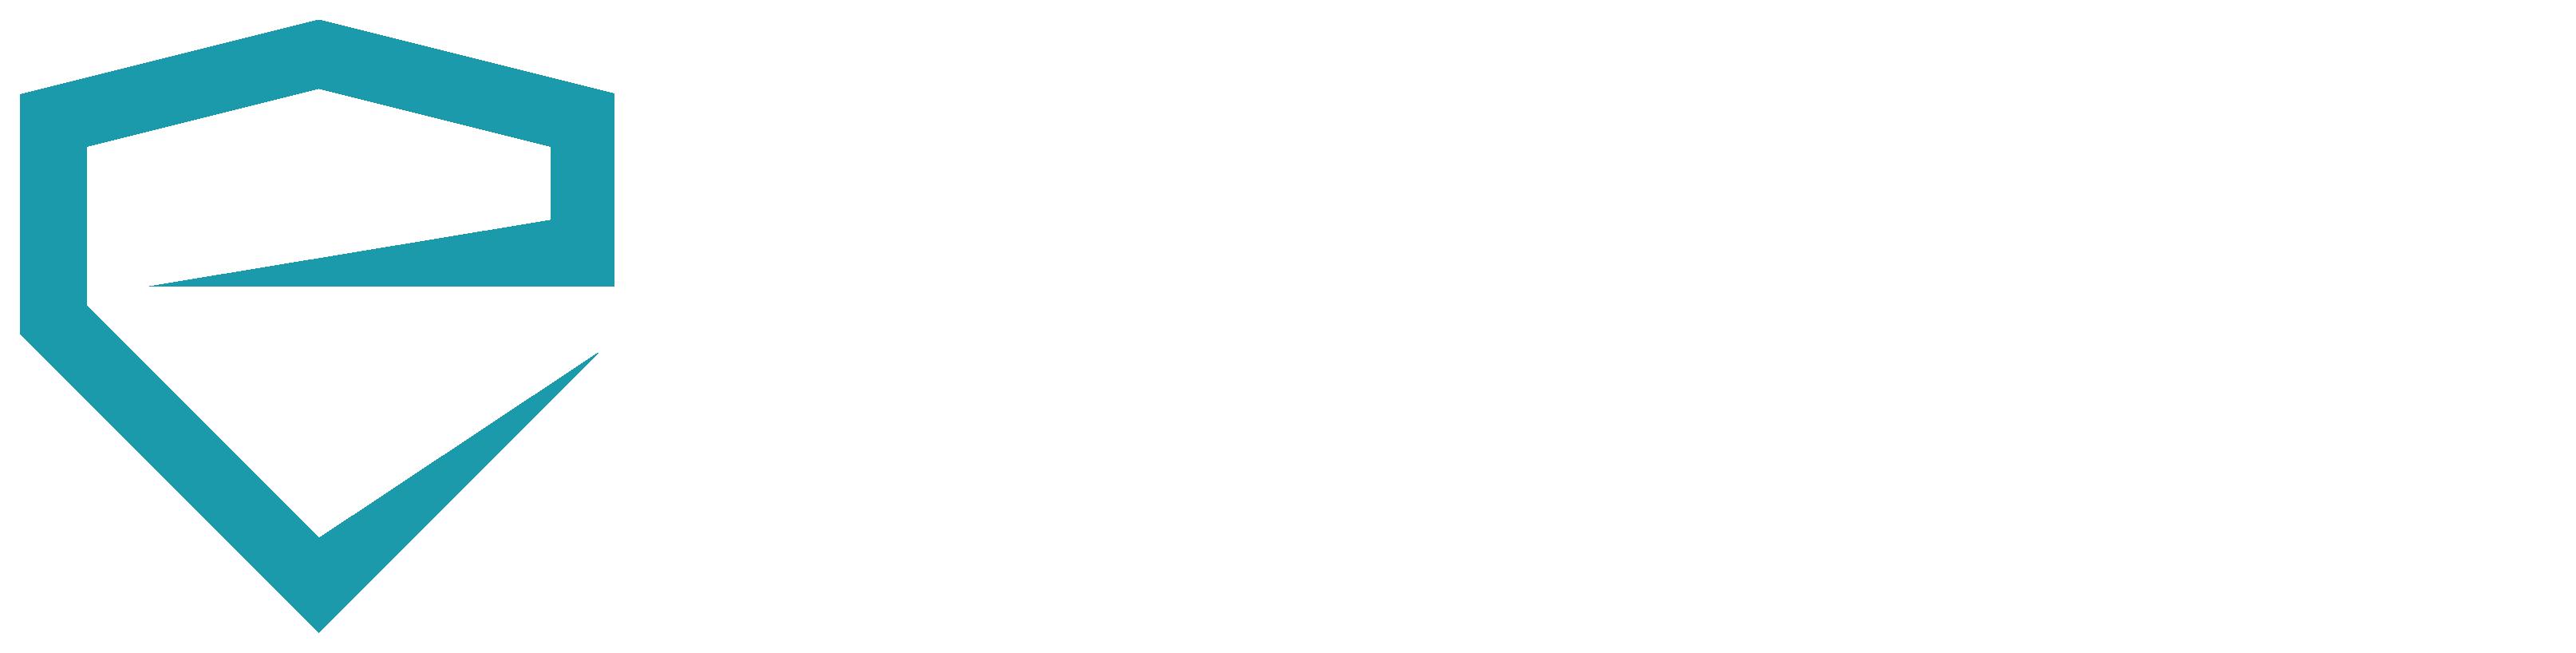 Logo for Entruity Wealth